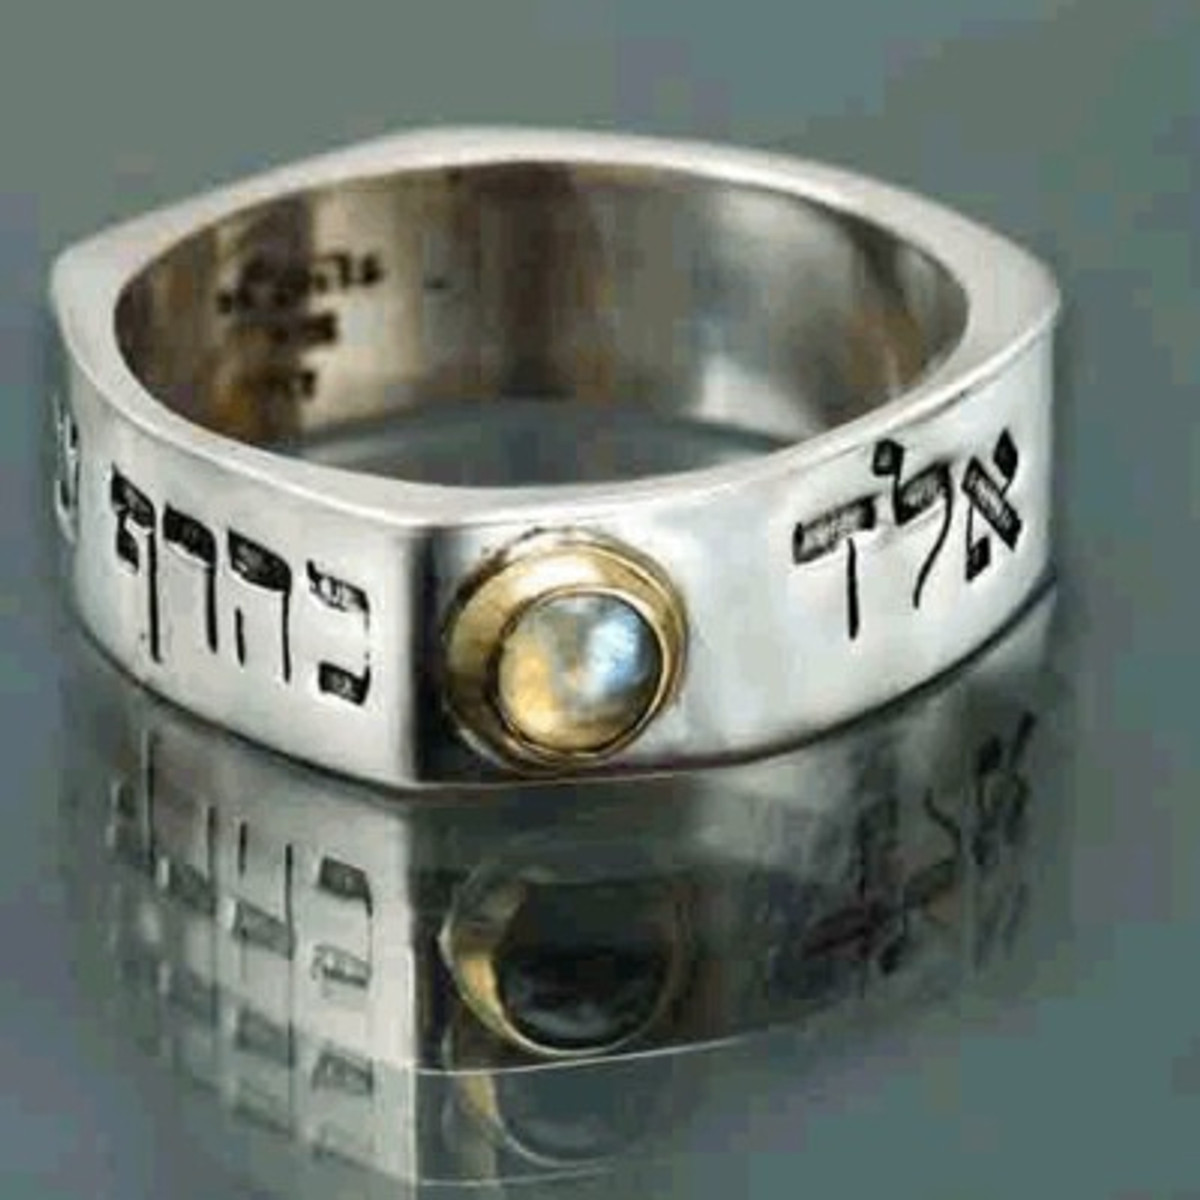 Kabbalah Square Ring With An Inserted Cheysoberyl Gem